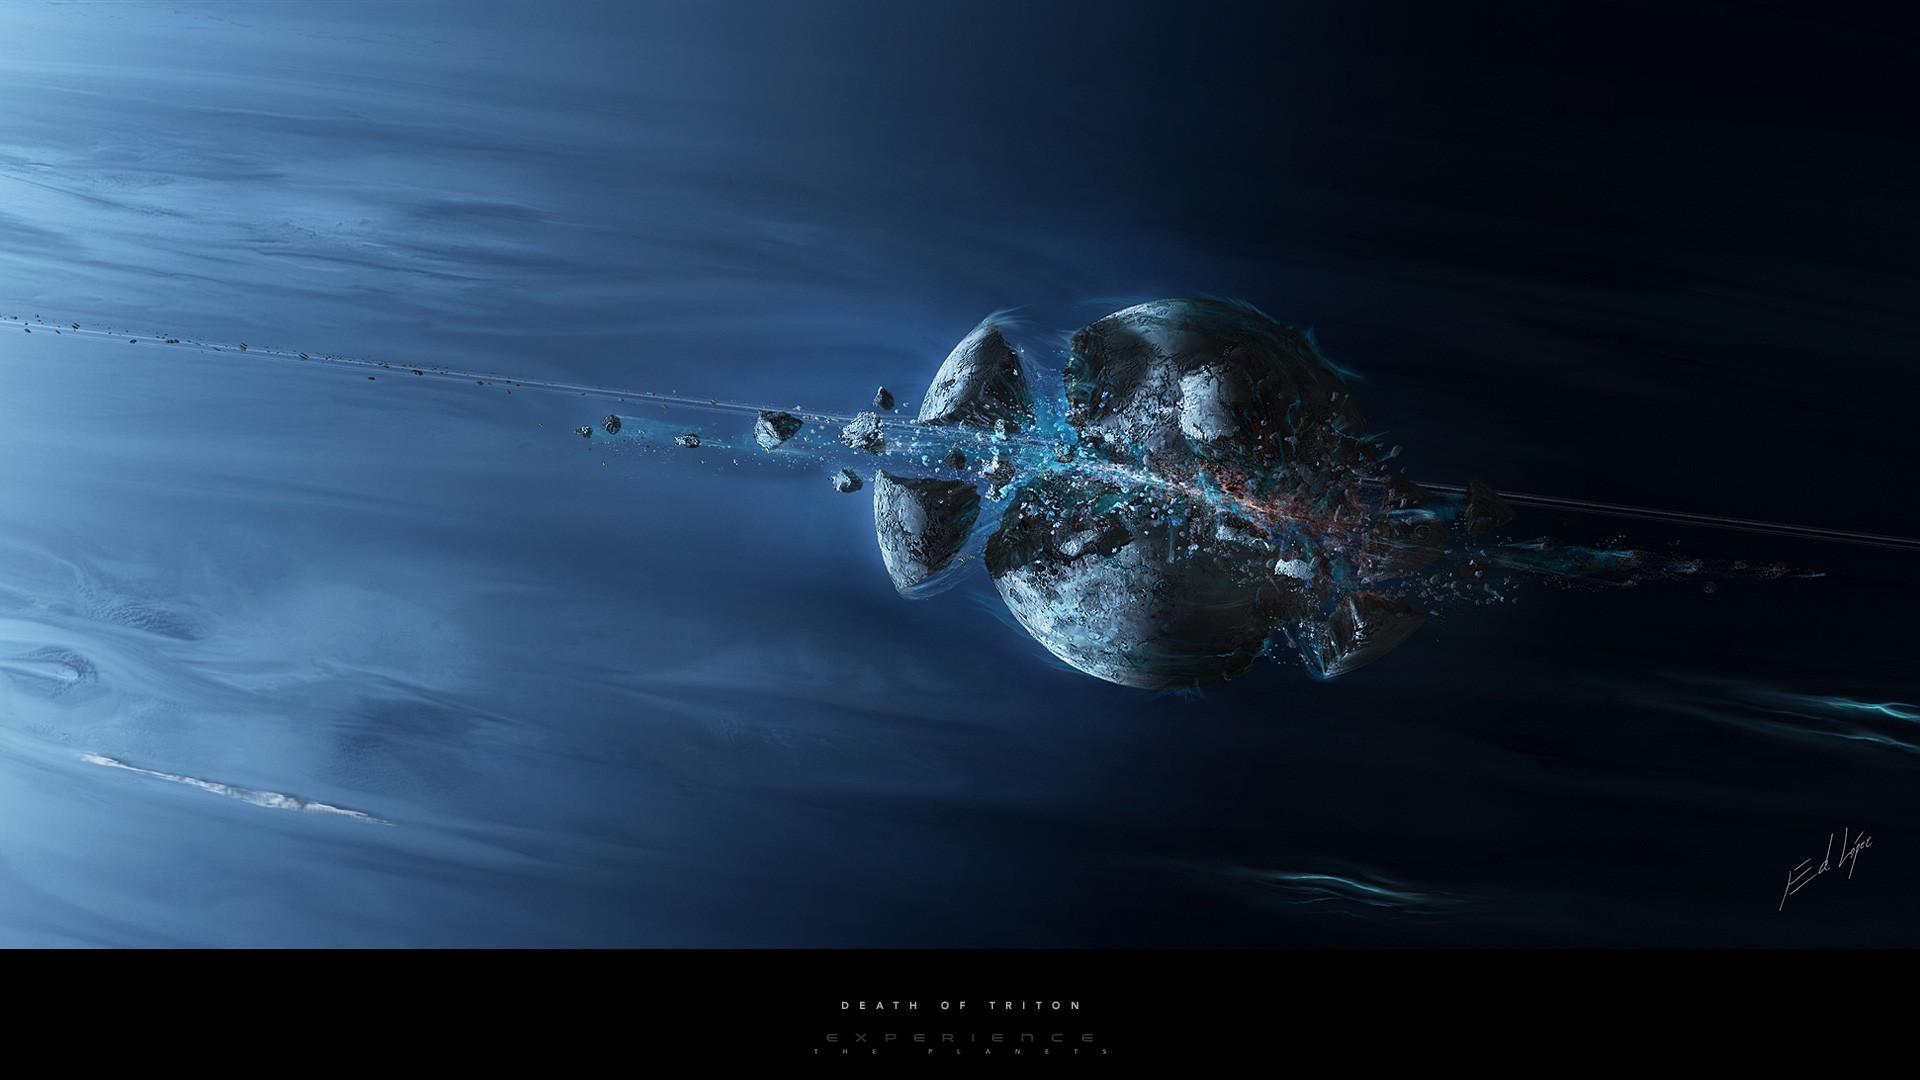 Space/Nasa Wallpapers